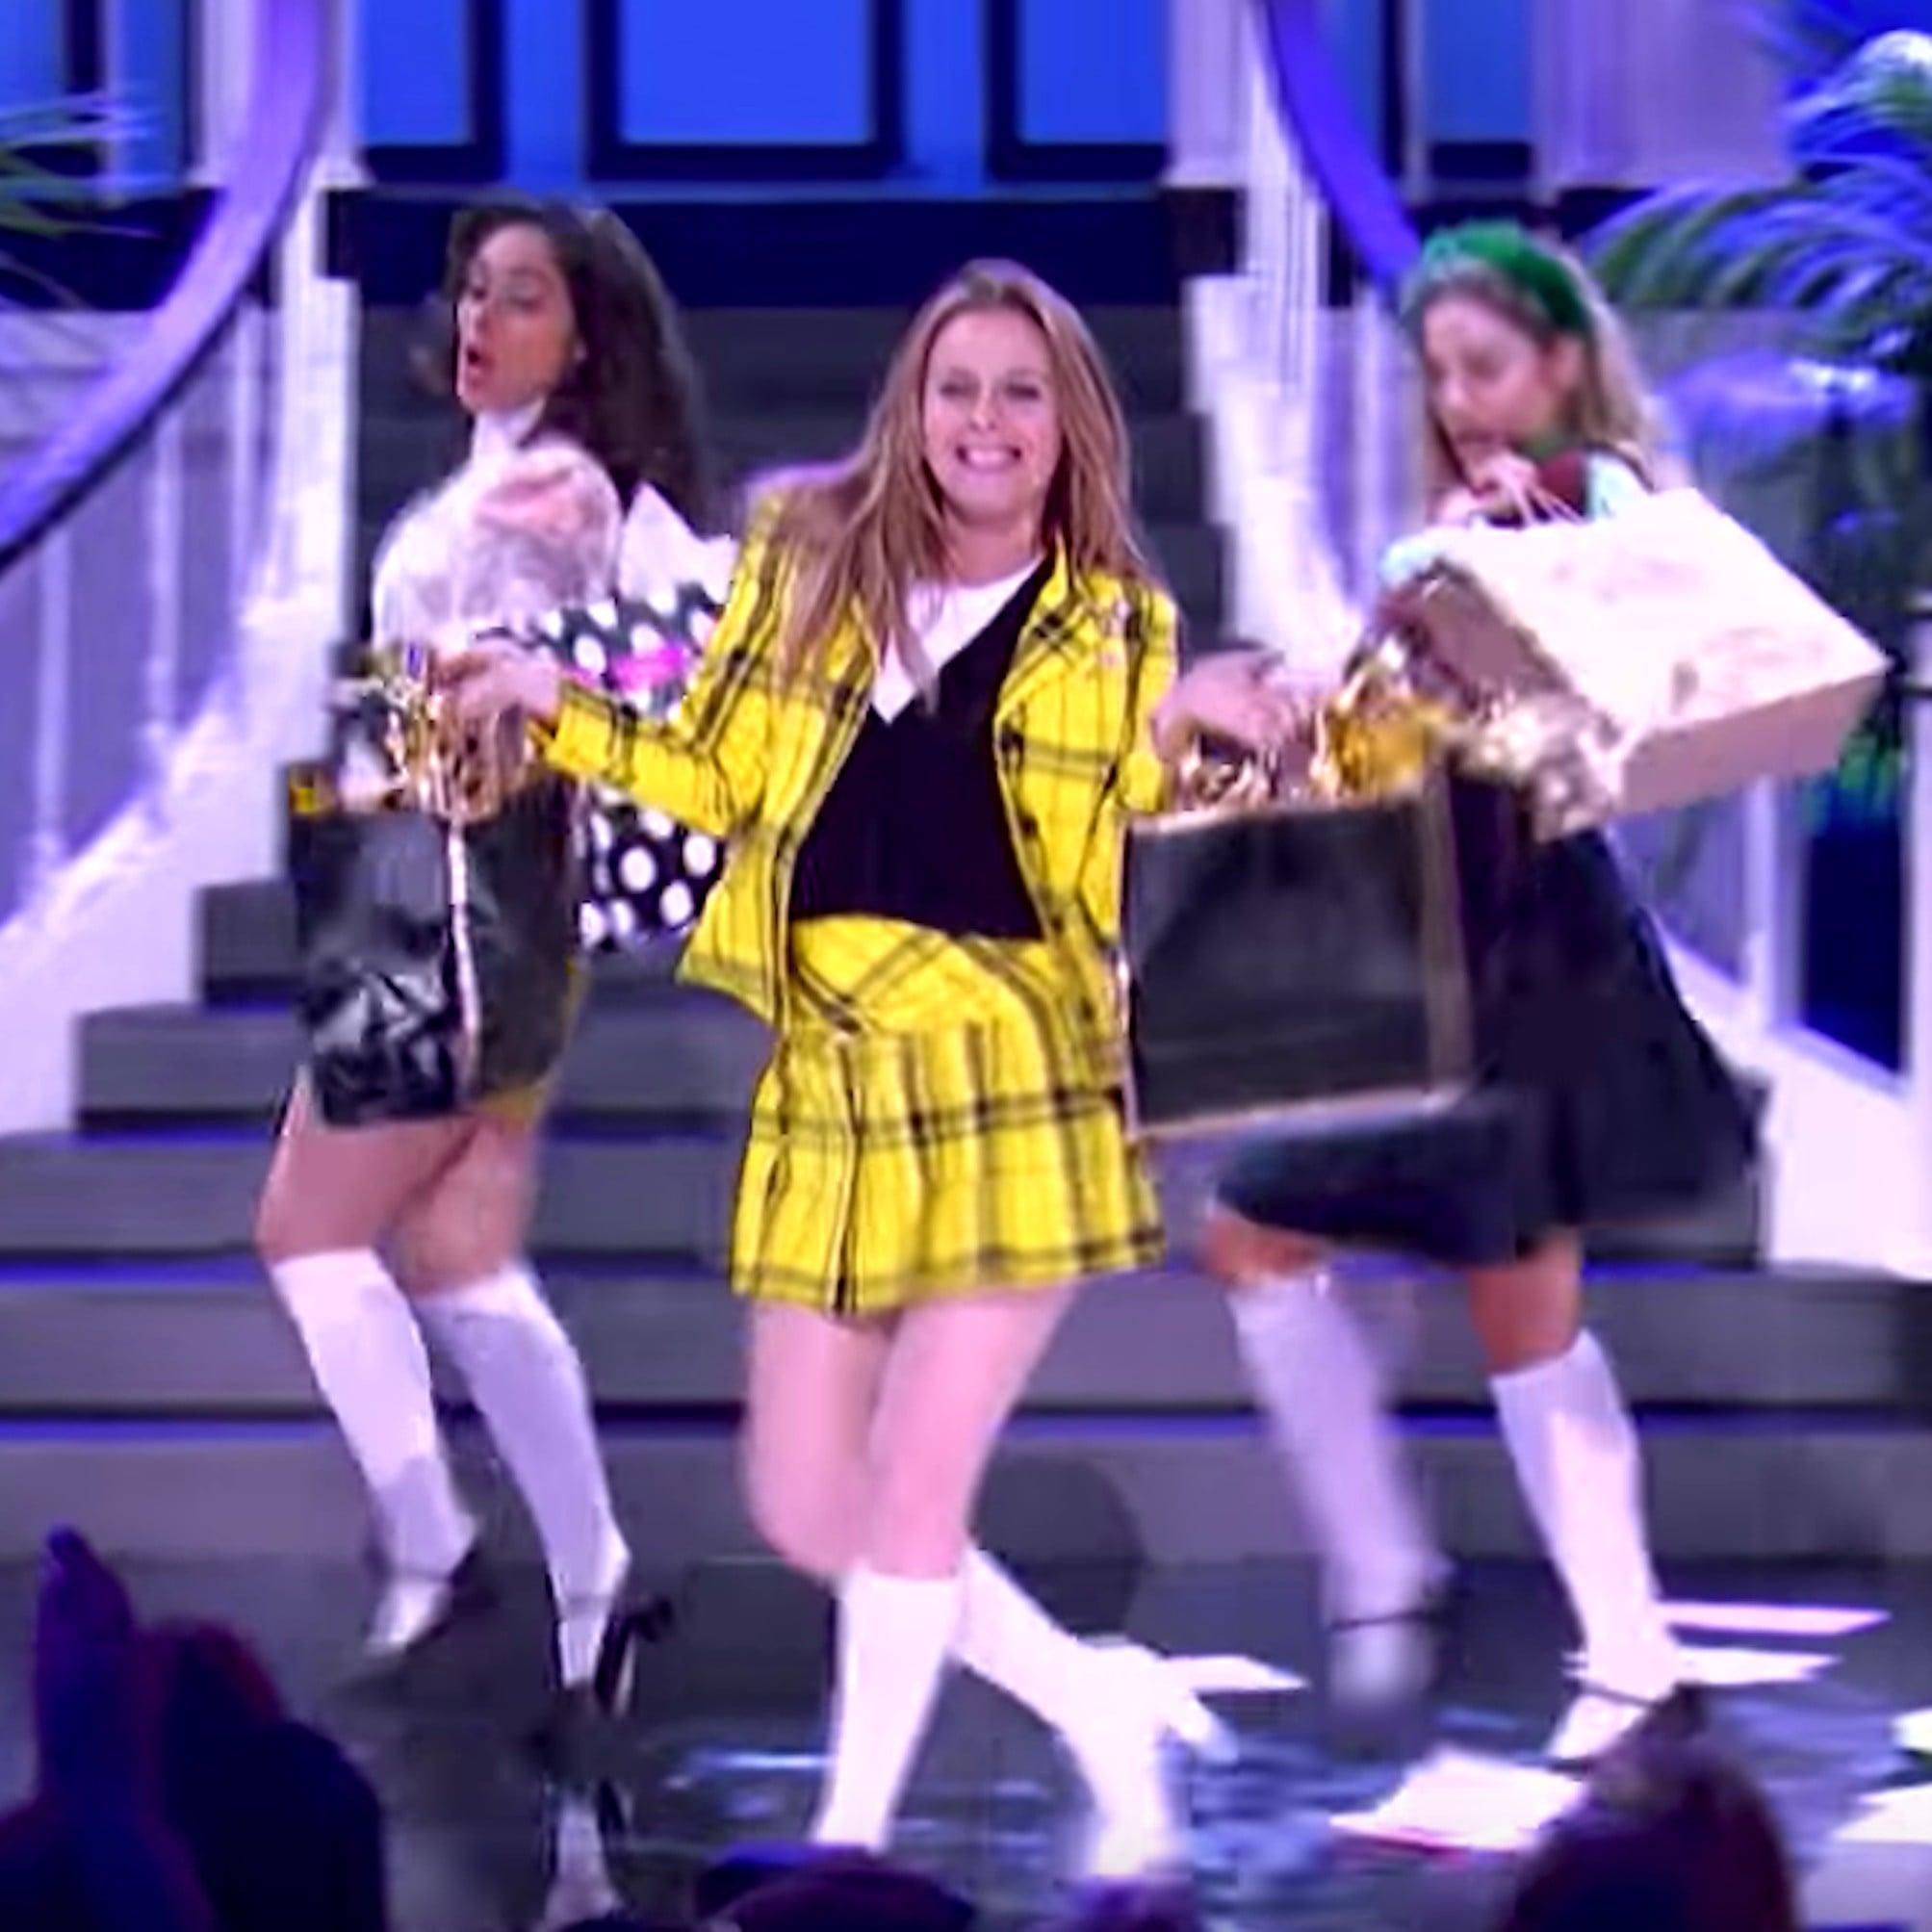 Alicia-Silverstone-Performs-Fancy-Lip-Sy